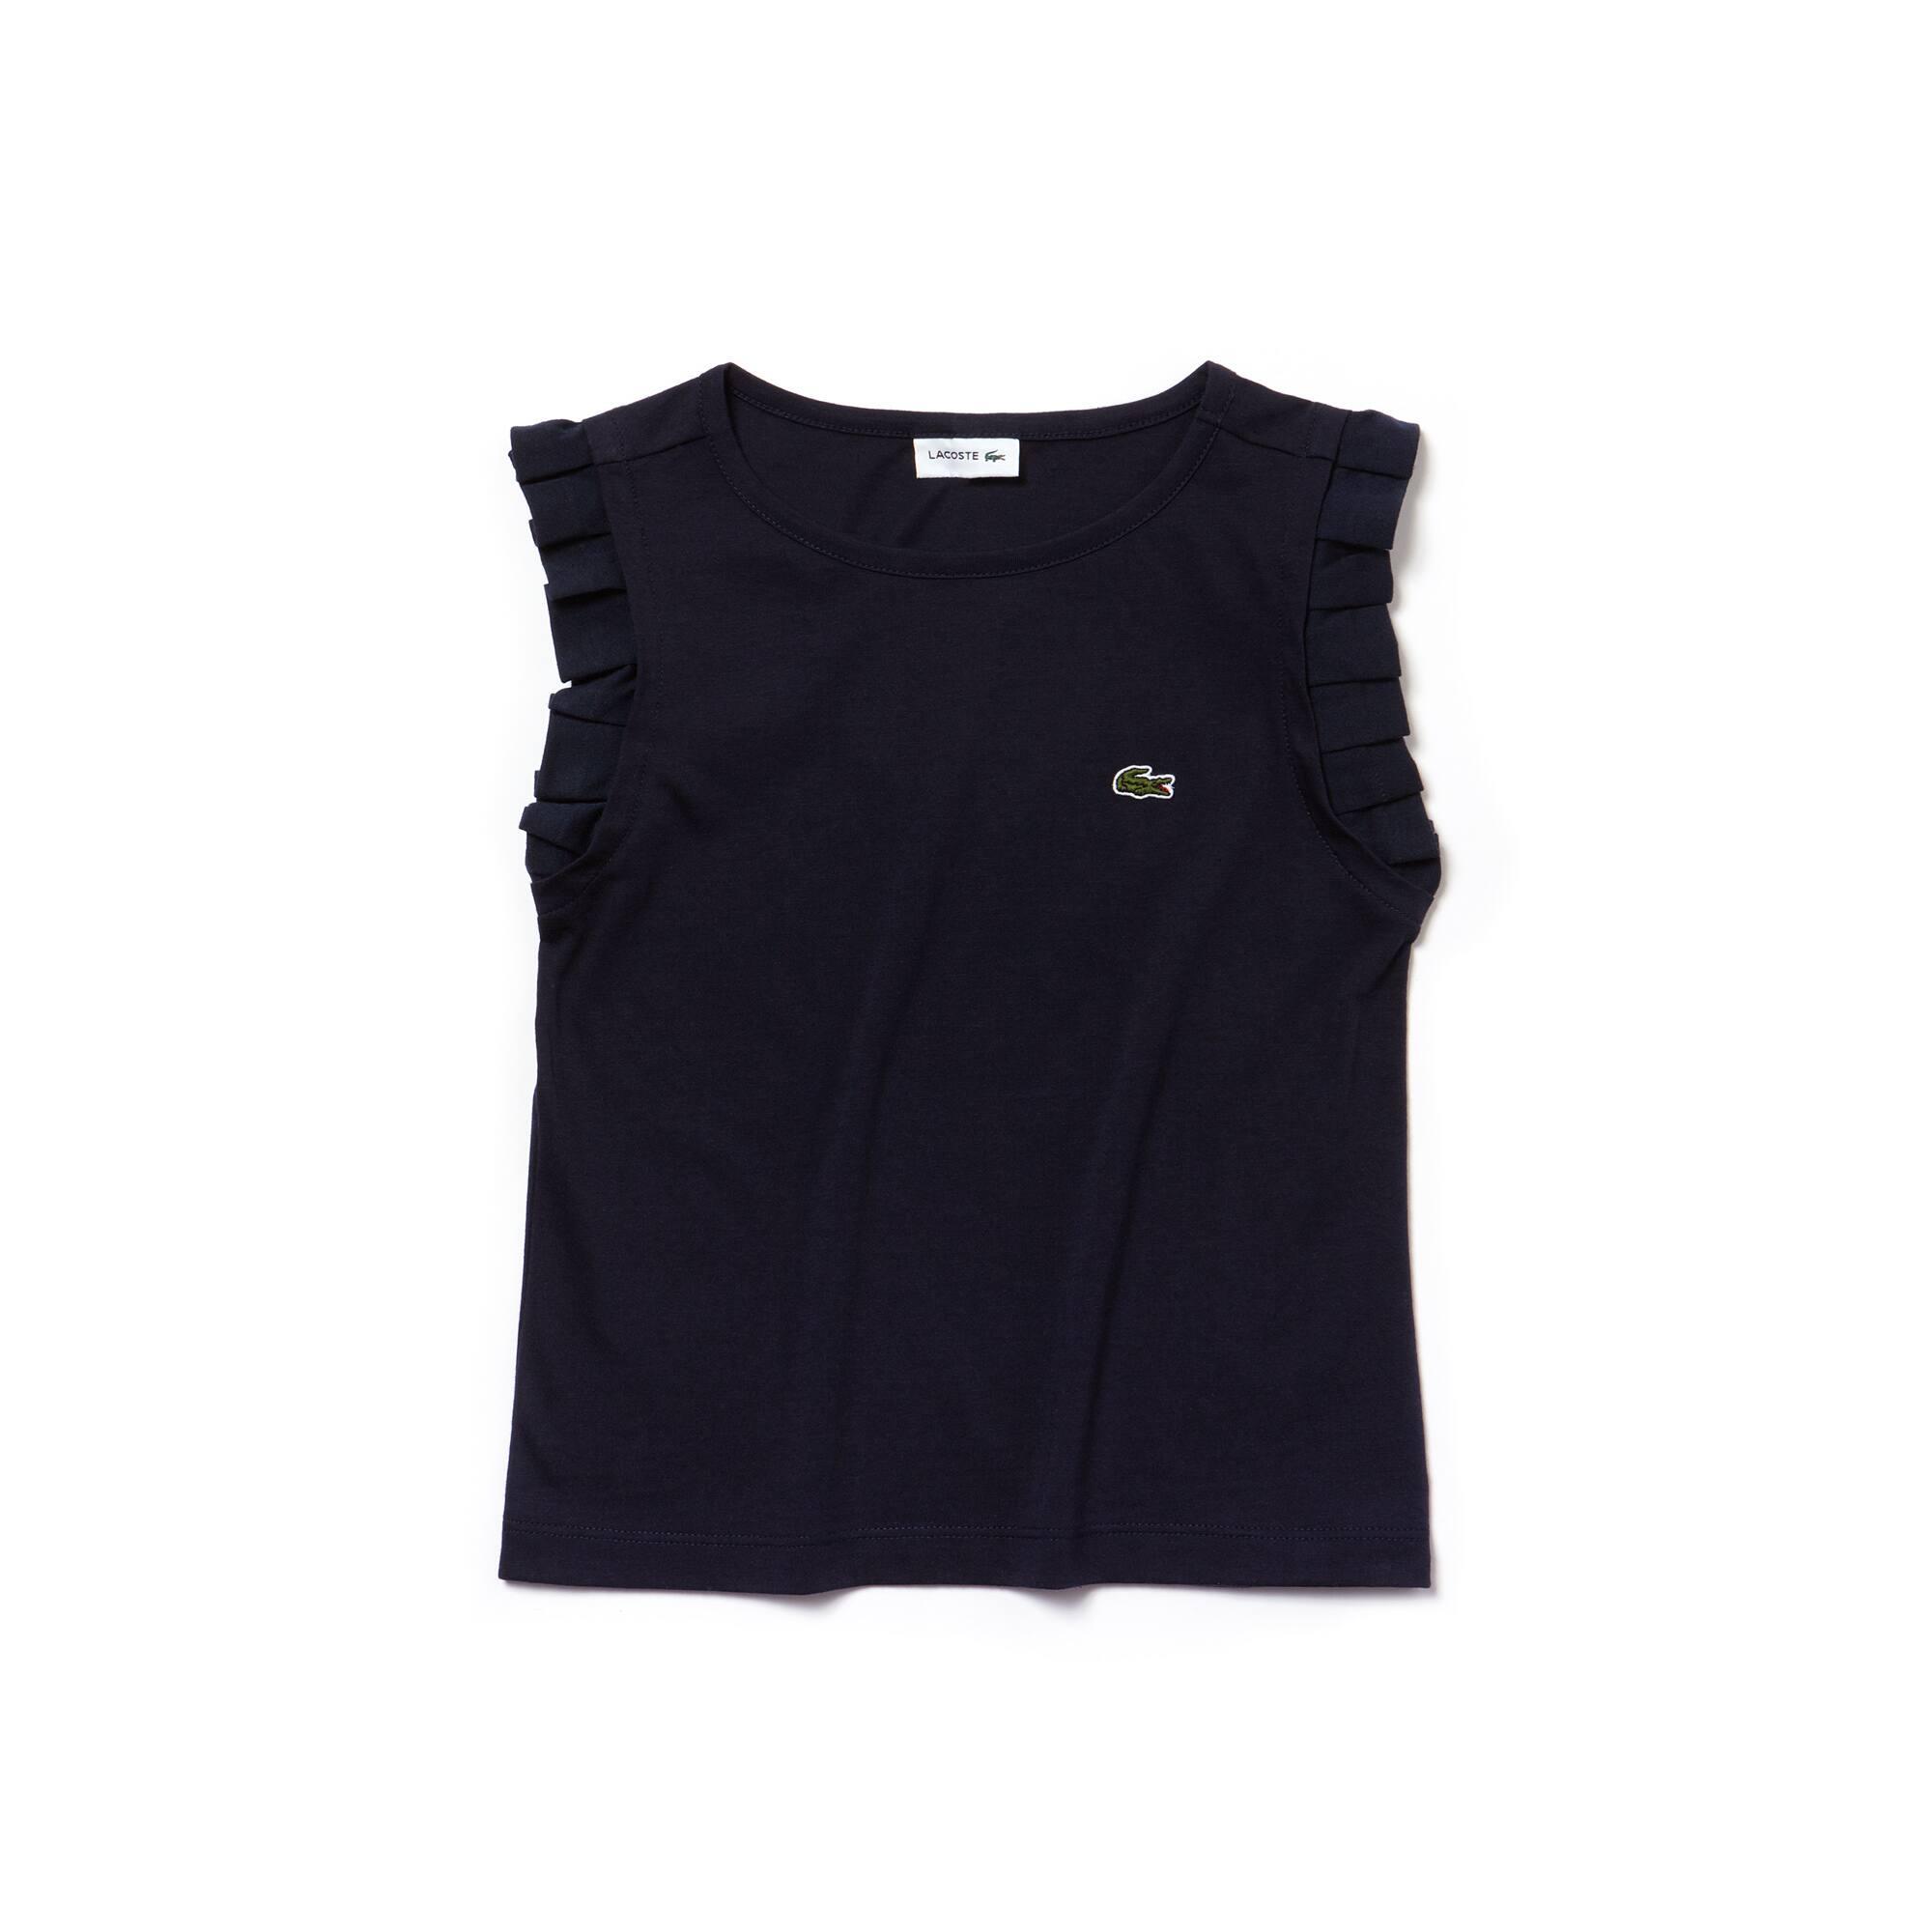 Girls' Crew Neck Flounced Shoulders Jersey T-shirt